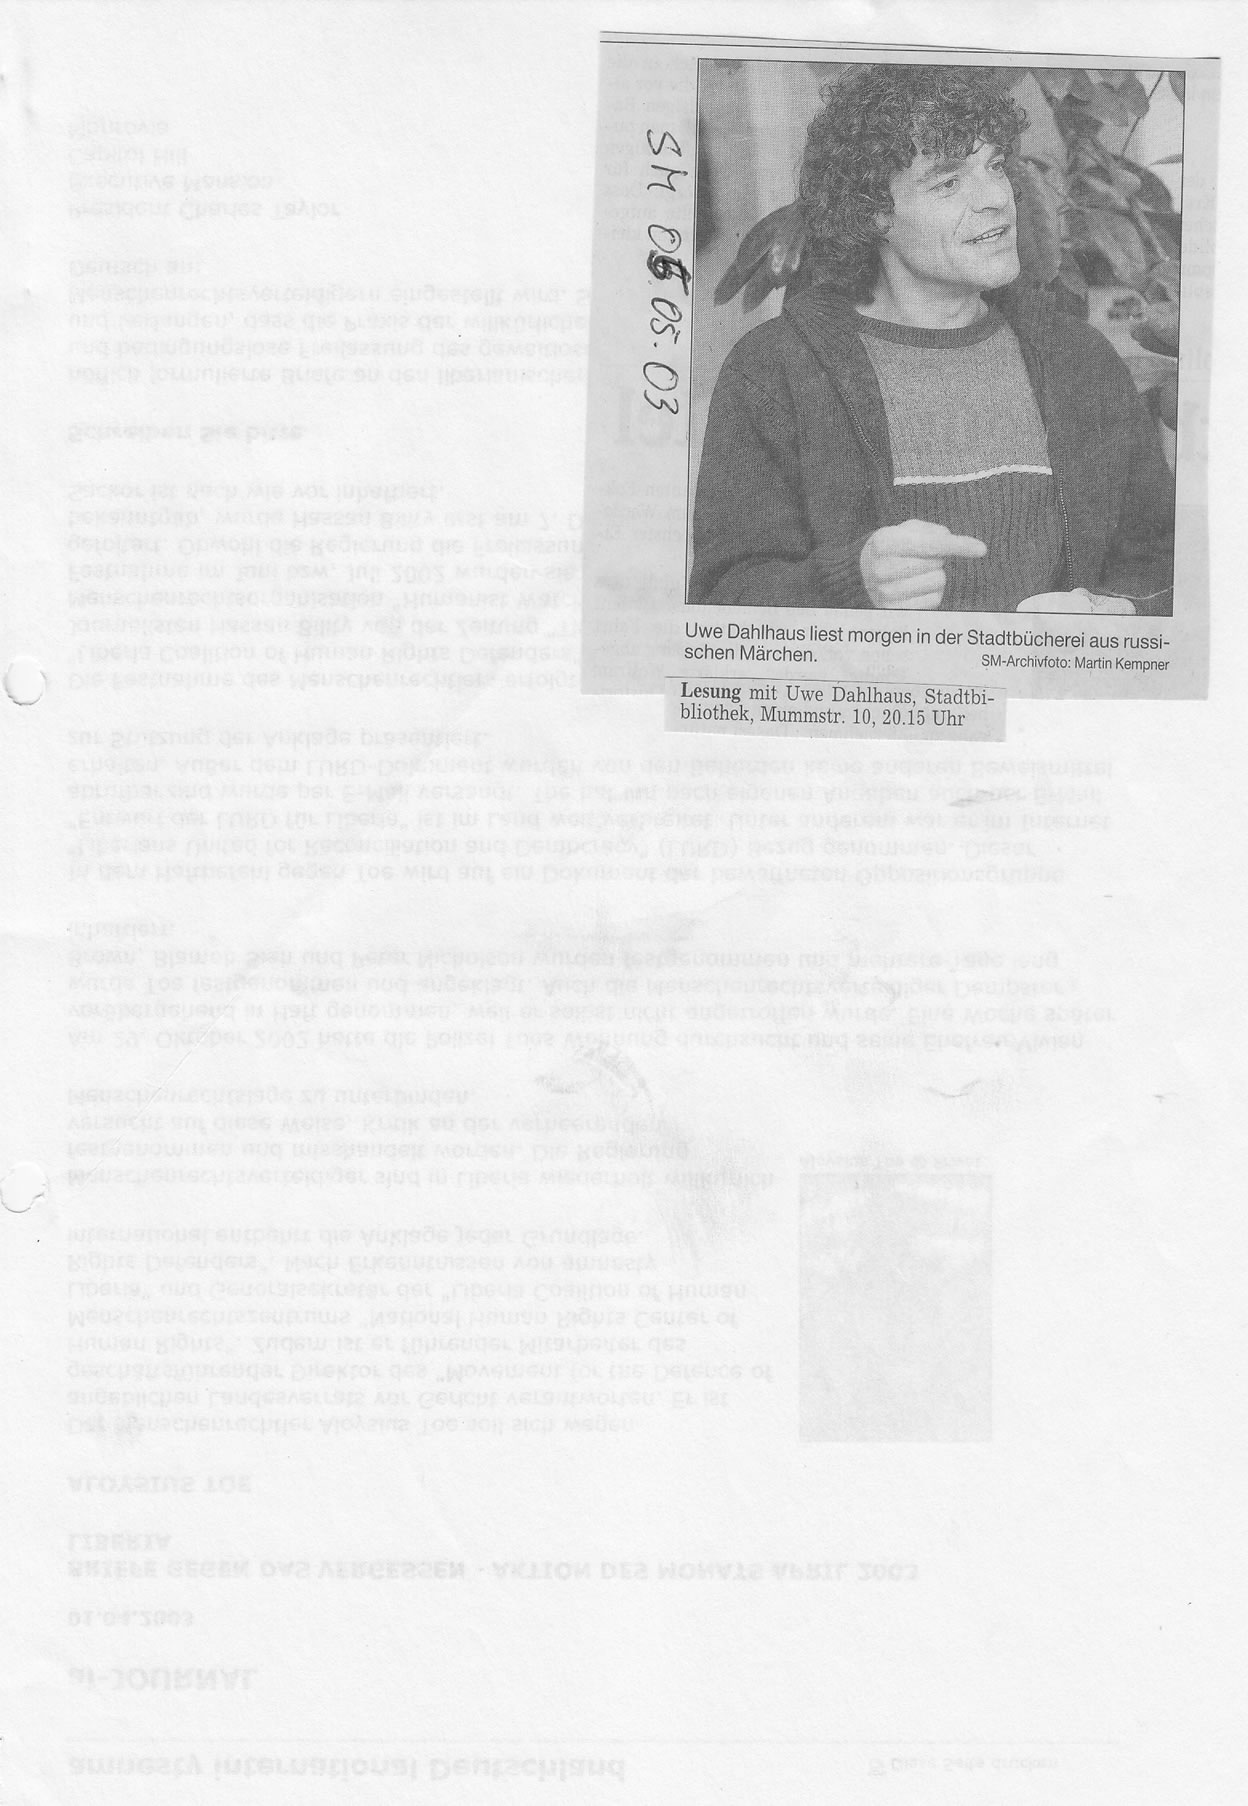 Ankündigung Solinger Morgenpost 05/03: Lesung Uwe Dahlhaus